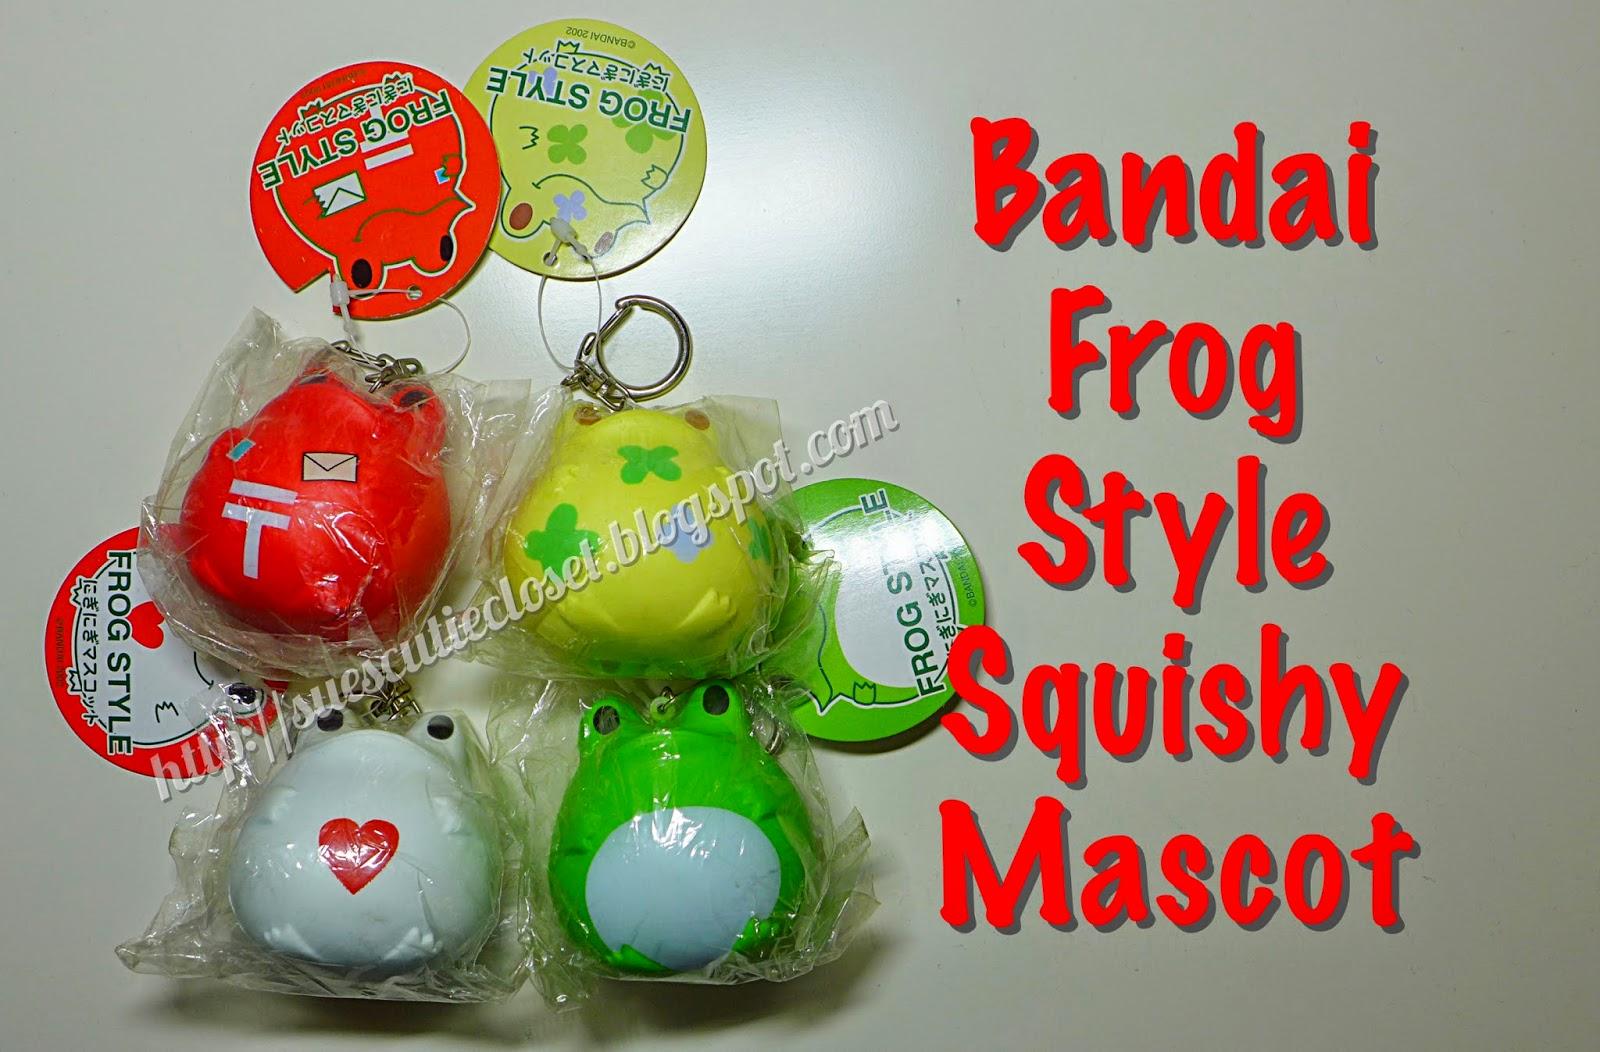 Squishy Haul Blog : Sue s Cutie Closet : Squishy Haul: Bandai Frog Style Squishy Mascot